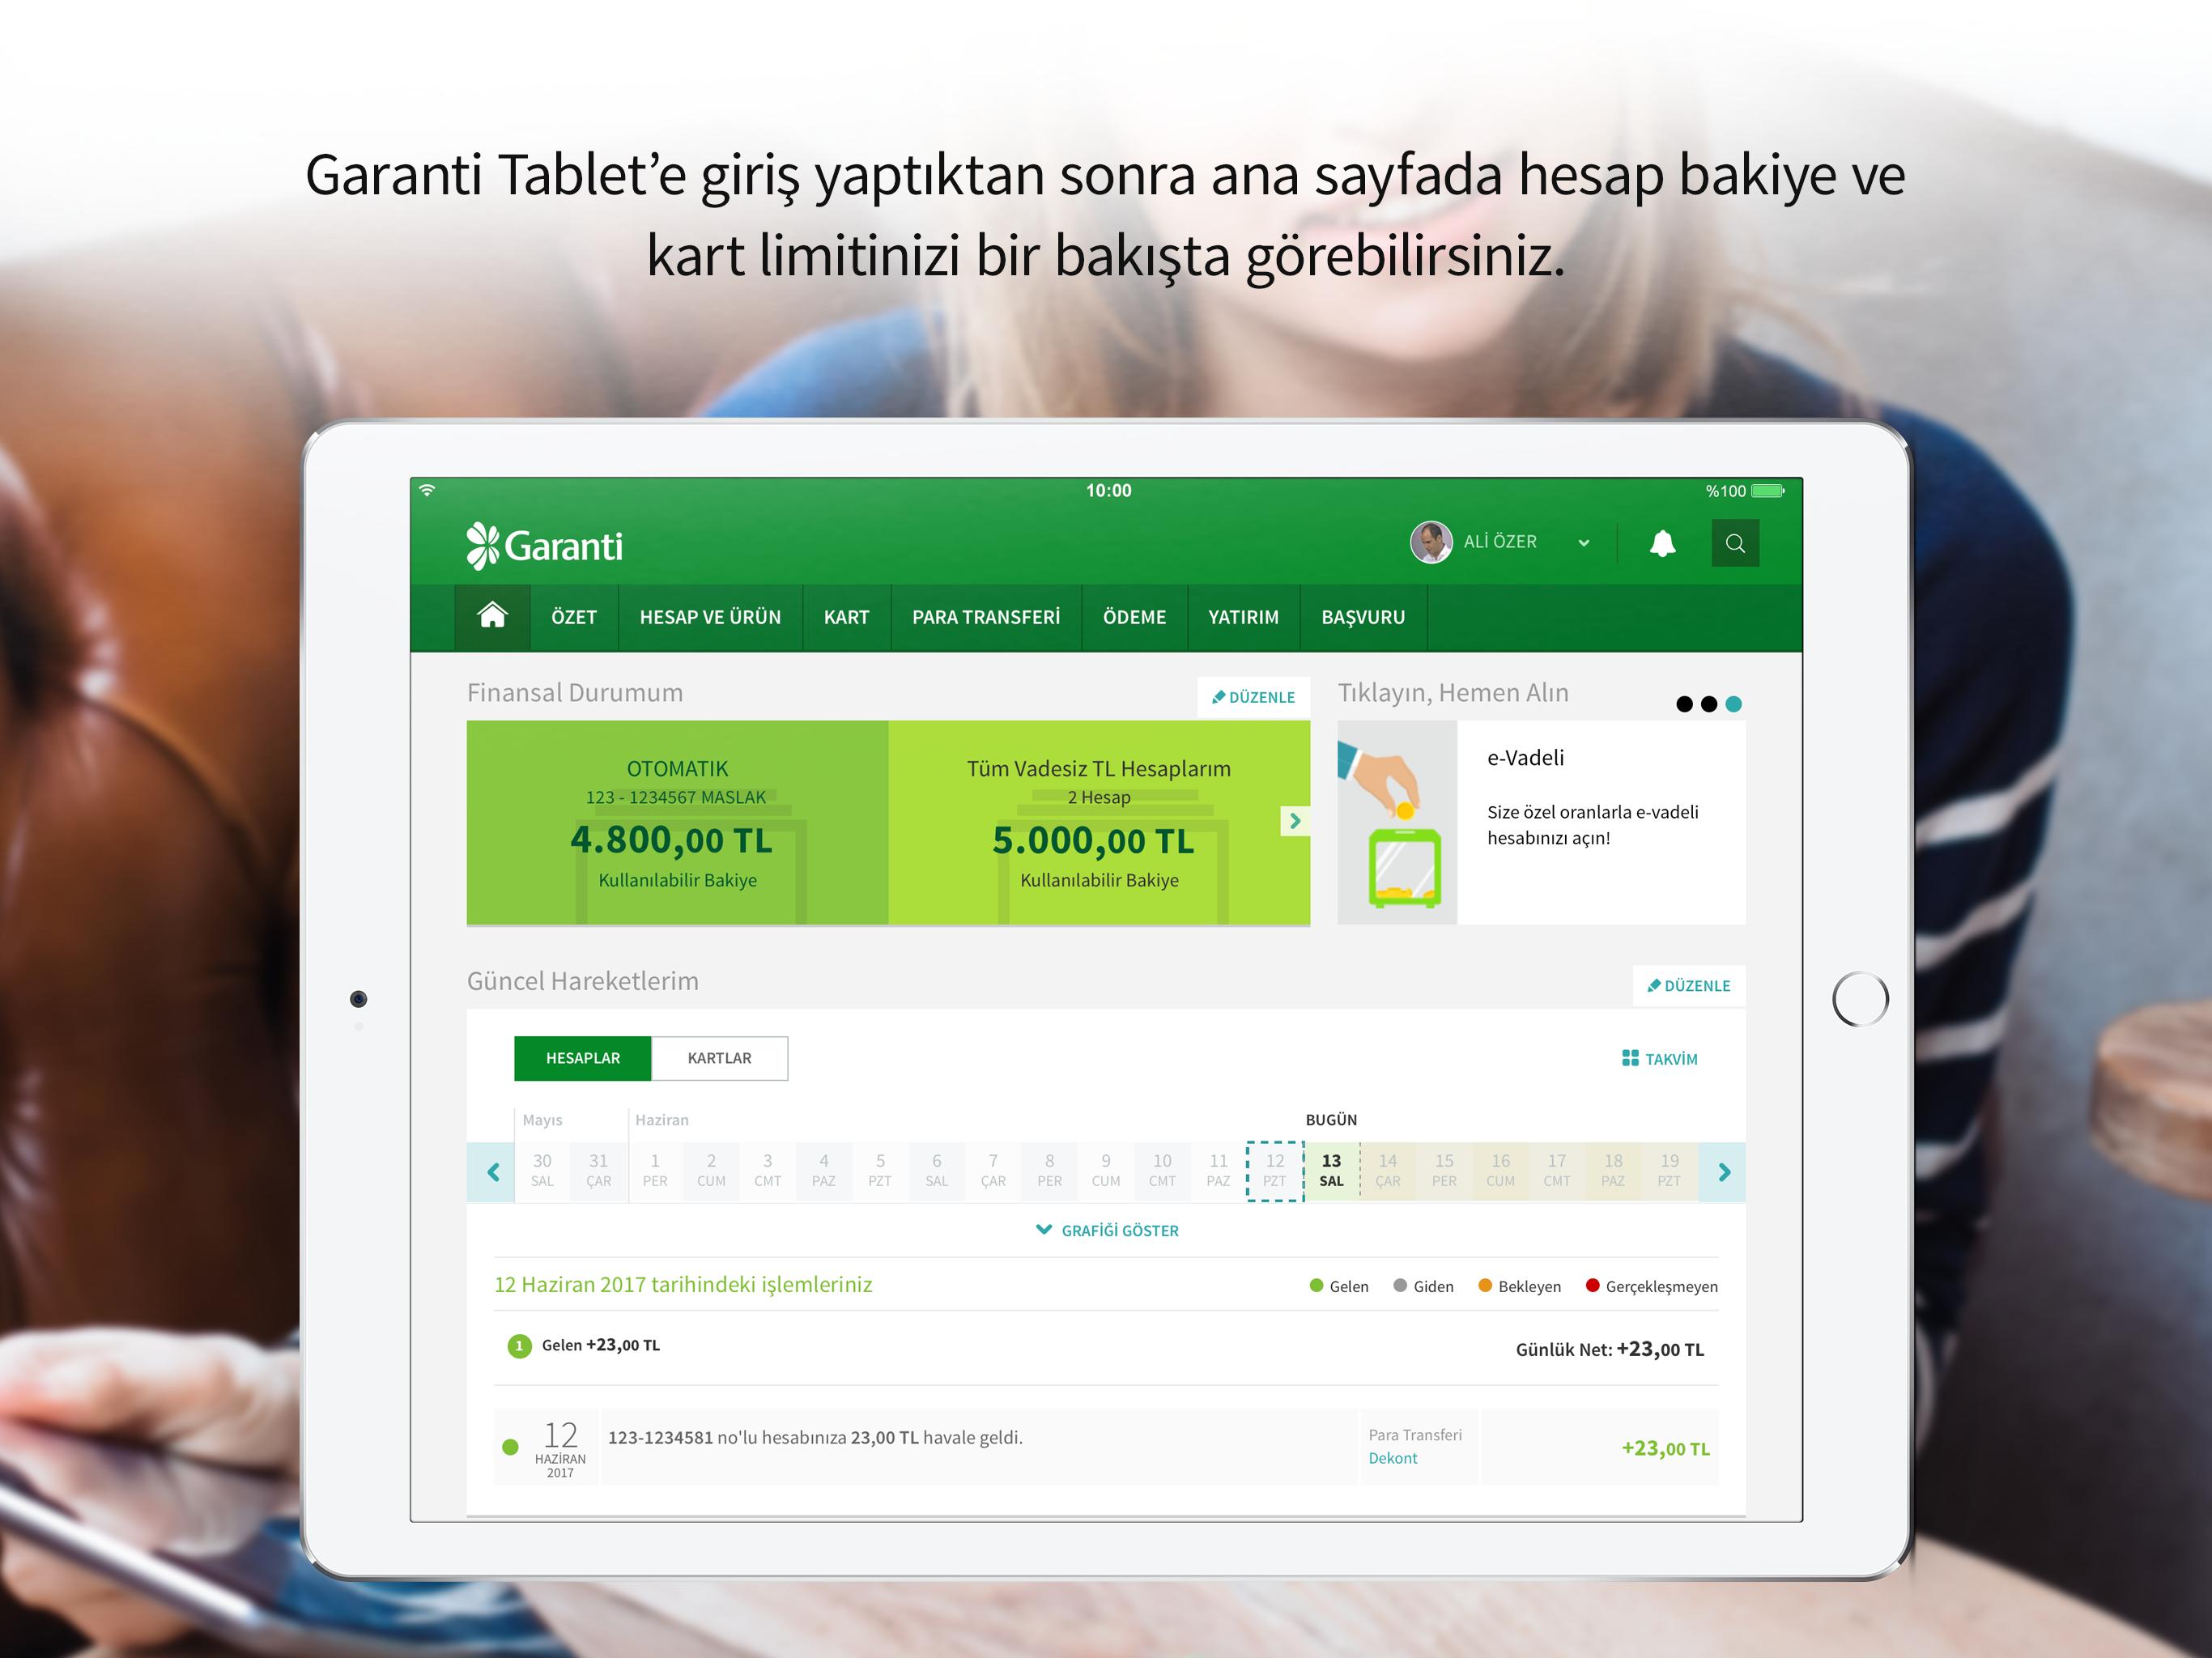 Garanti Tablet Screenshot